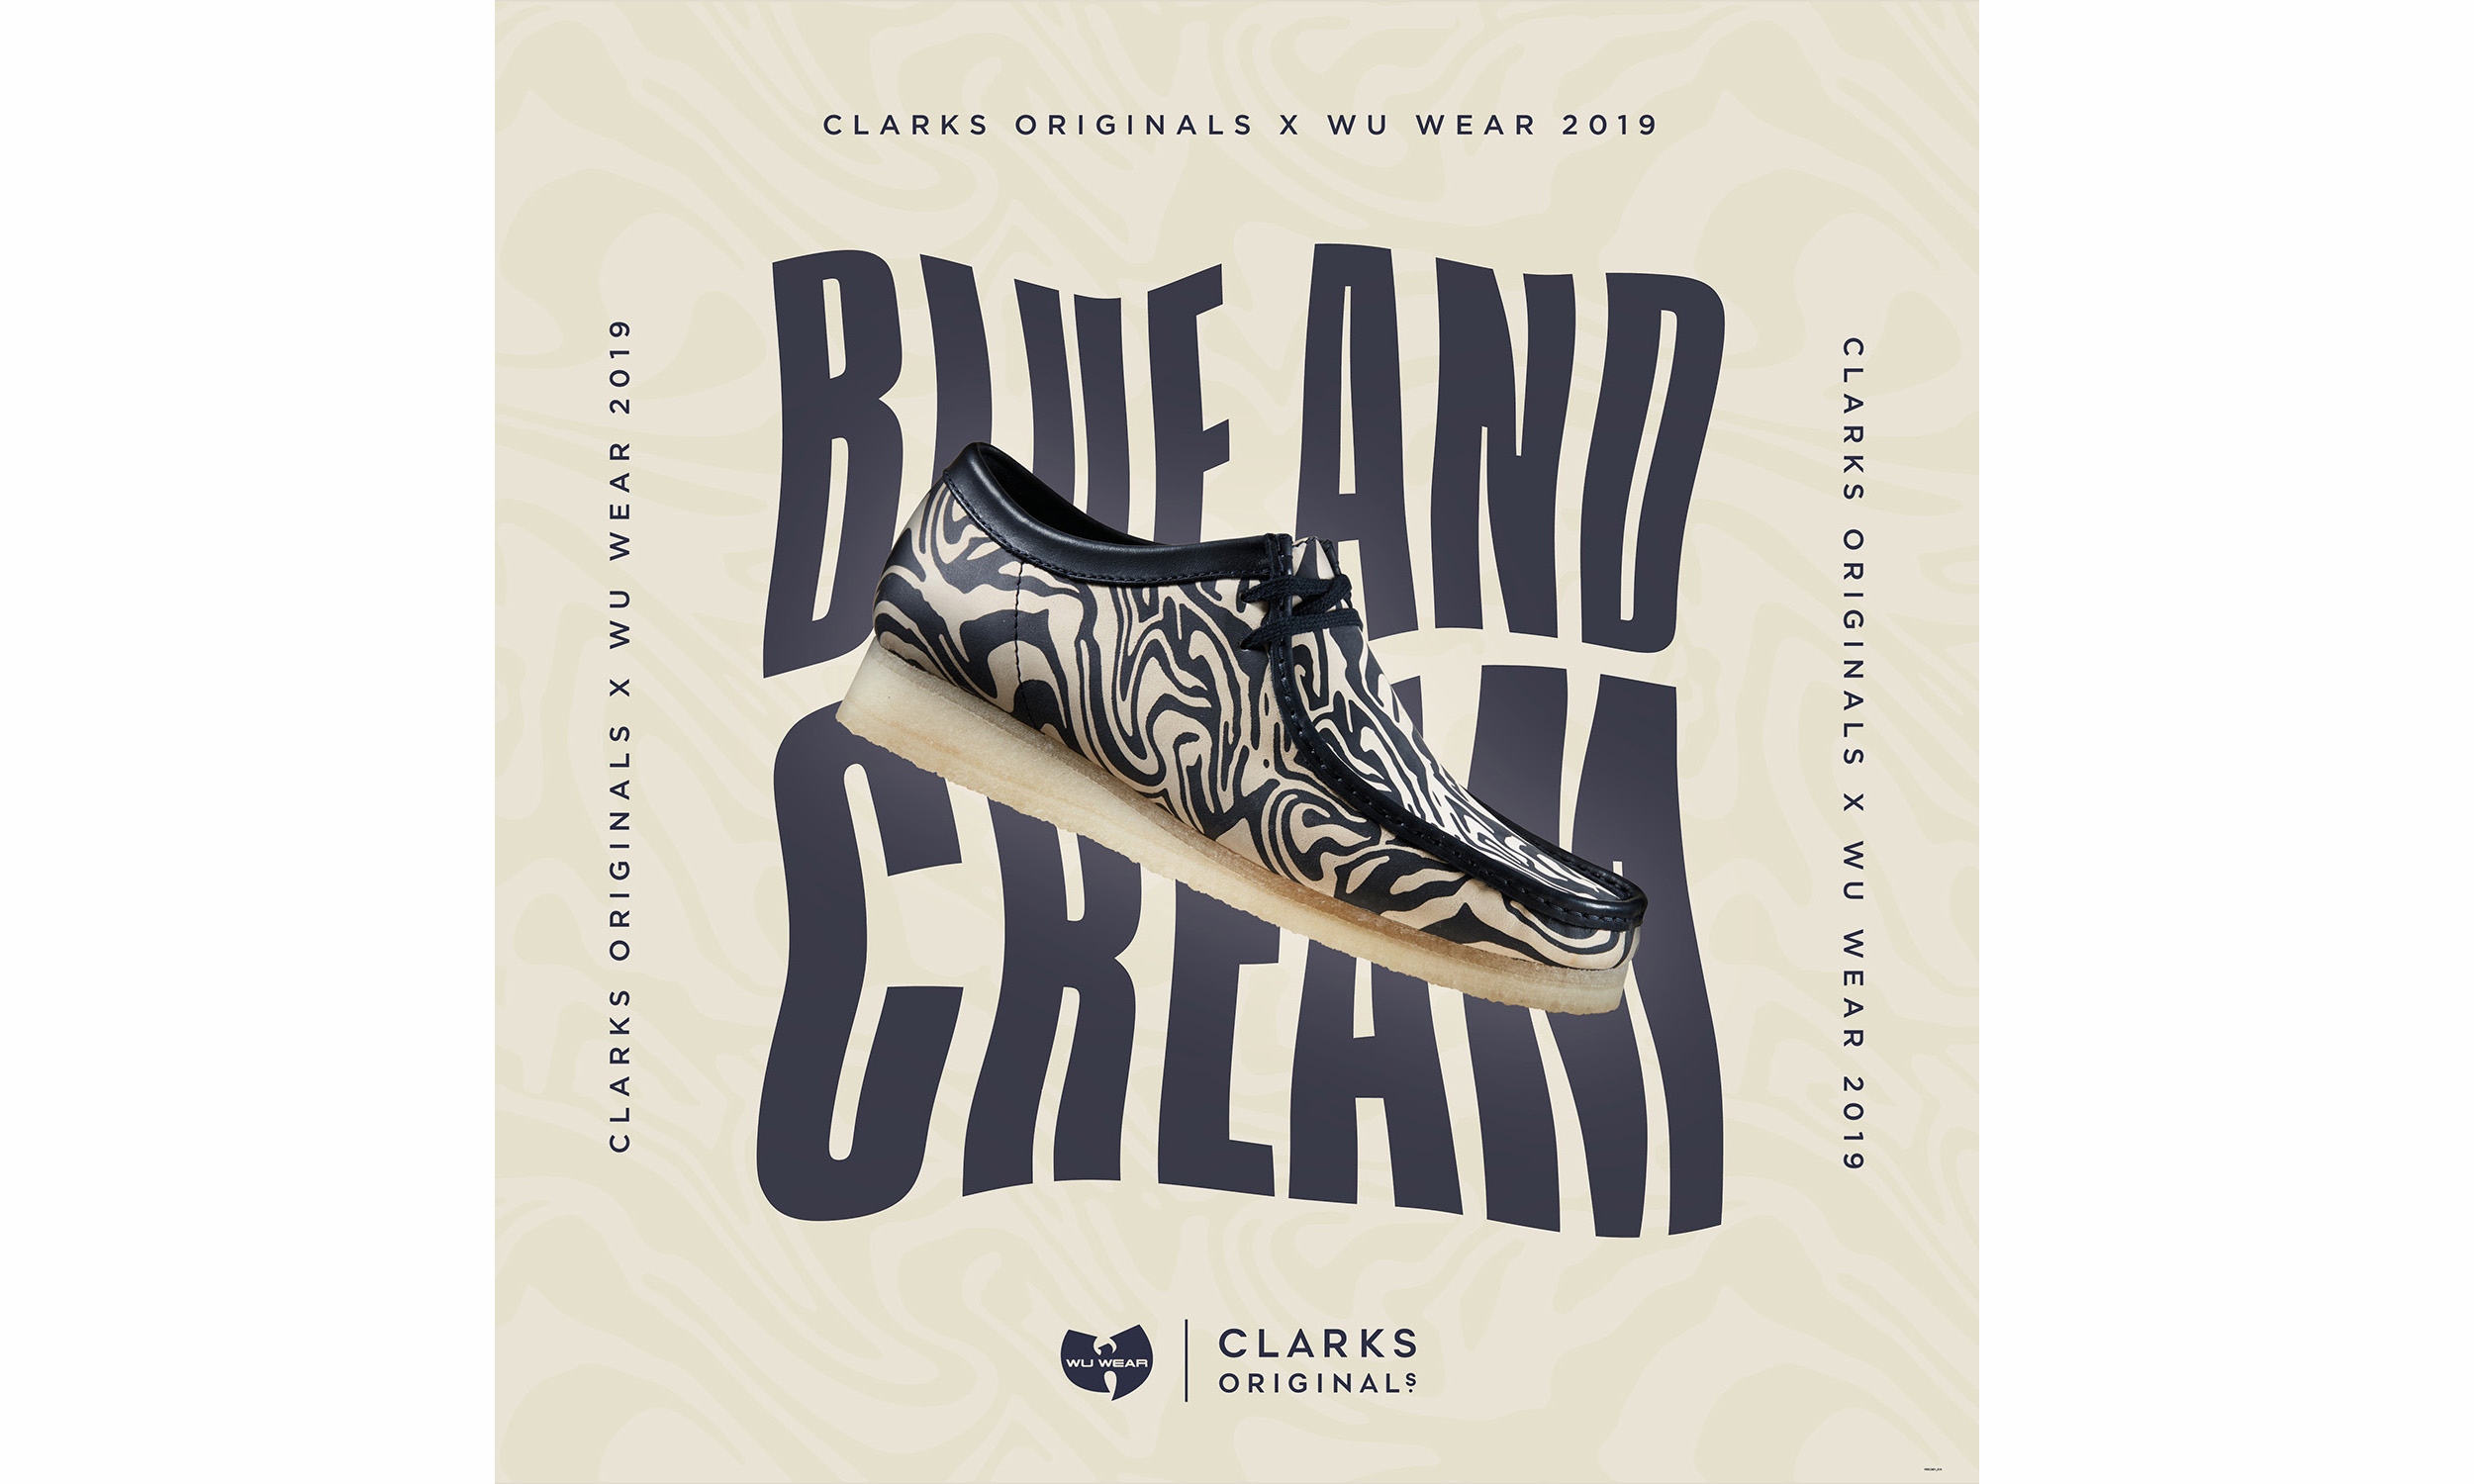 Wu Wear x Clarks 联名 Wallabee 鞋款第 2 弹释出